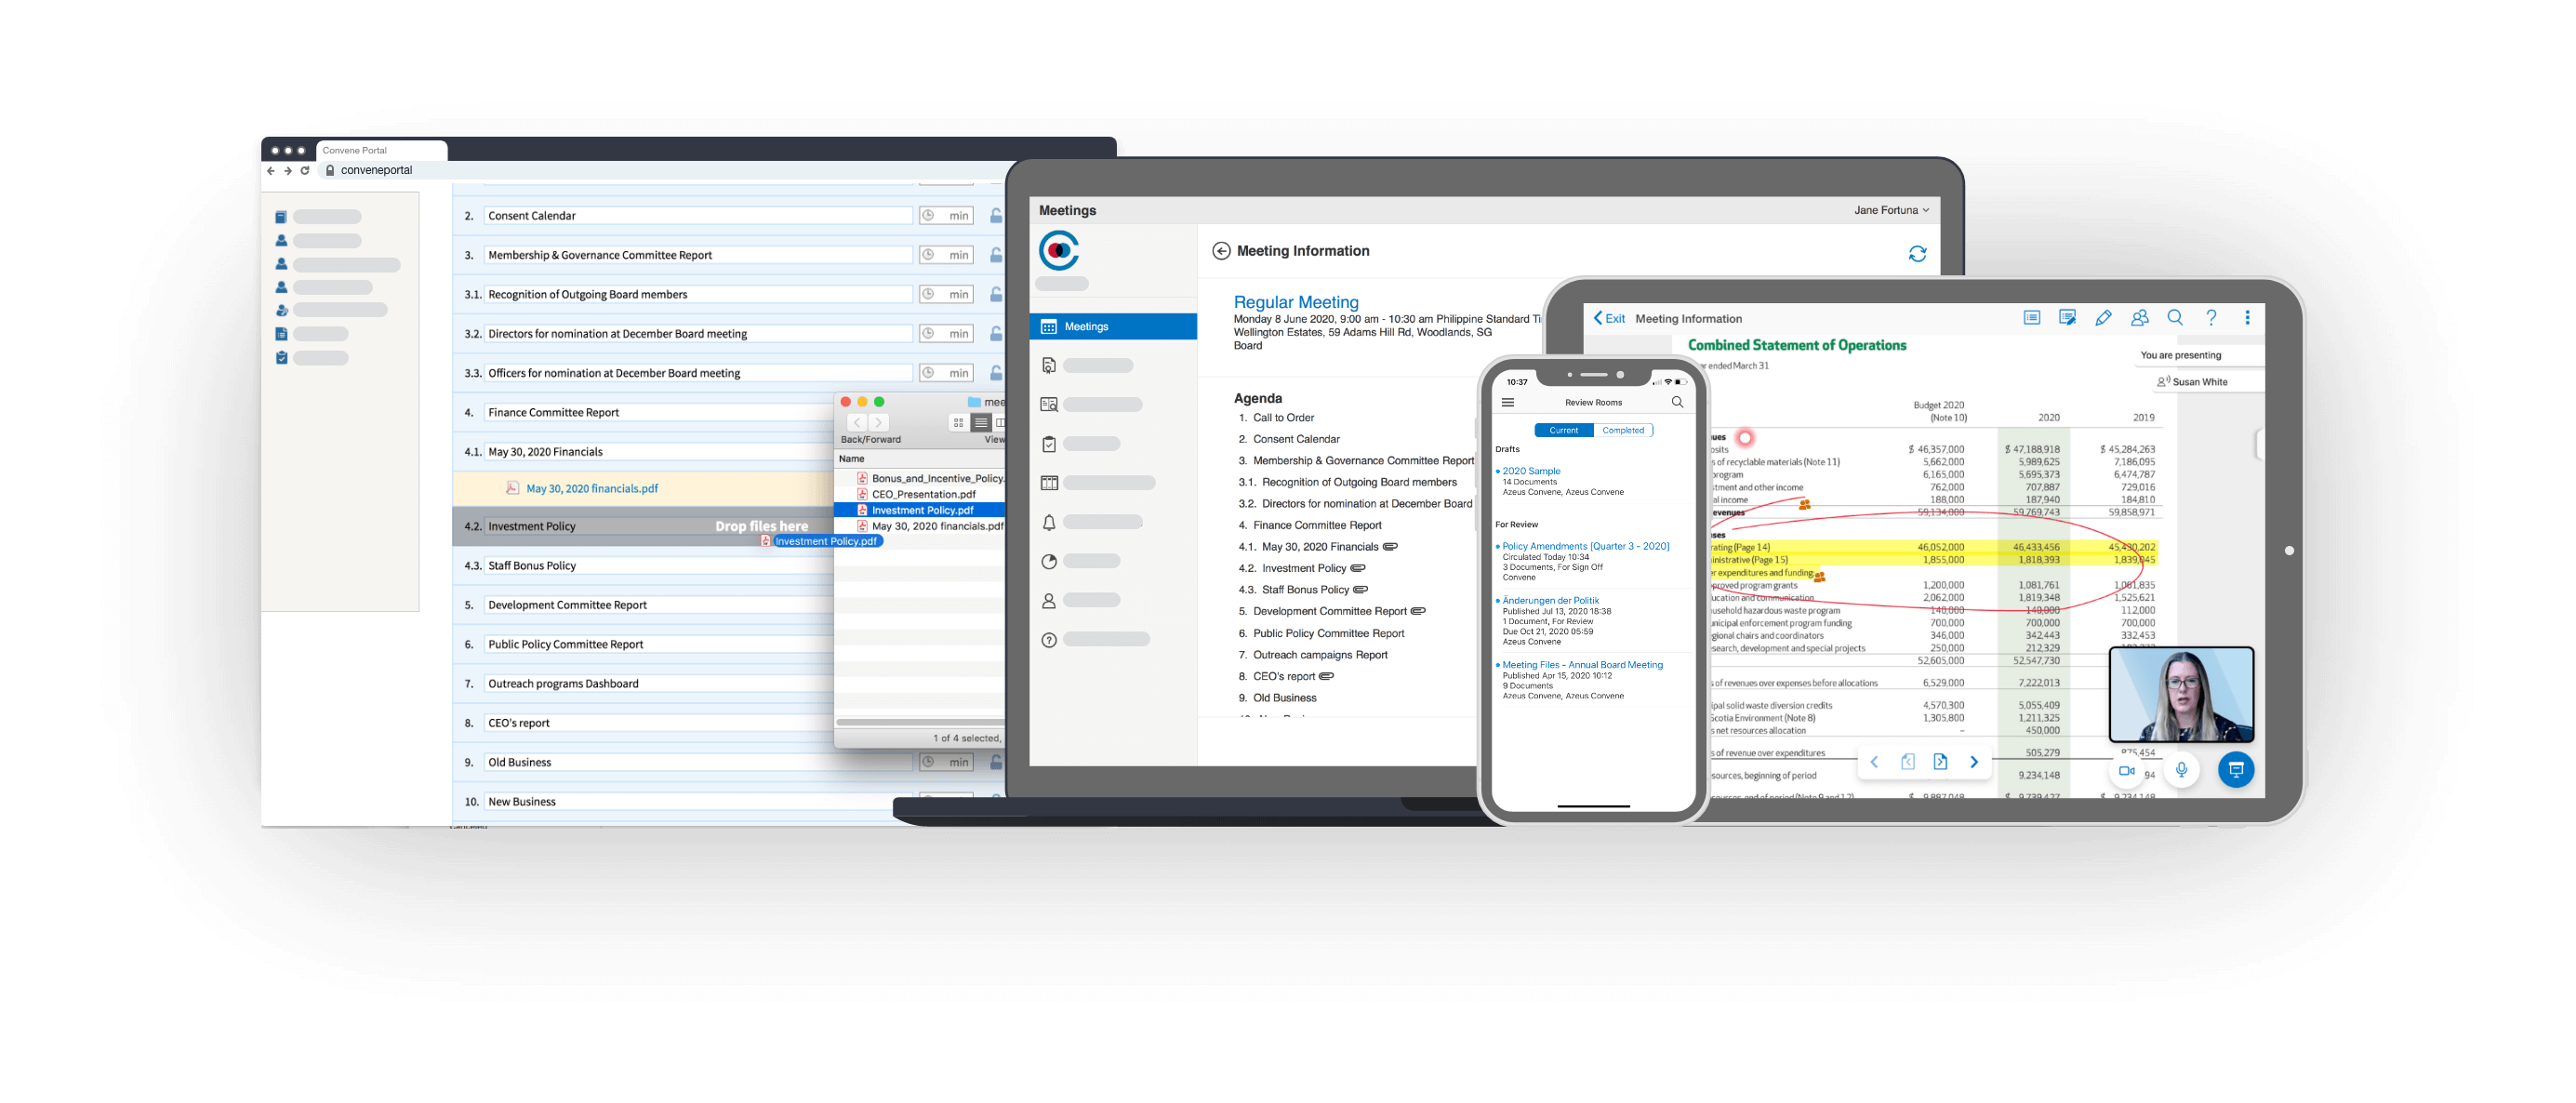 Azeus Convene Software - Multi-platform capability